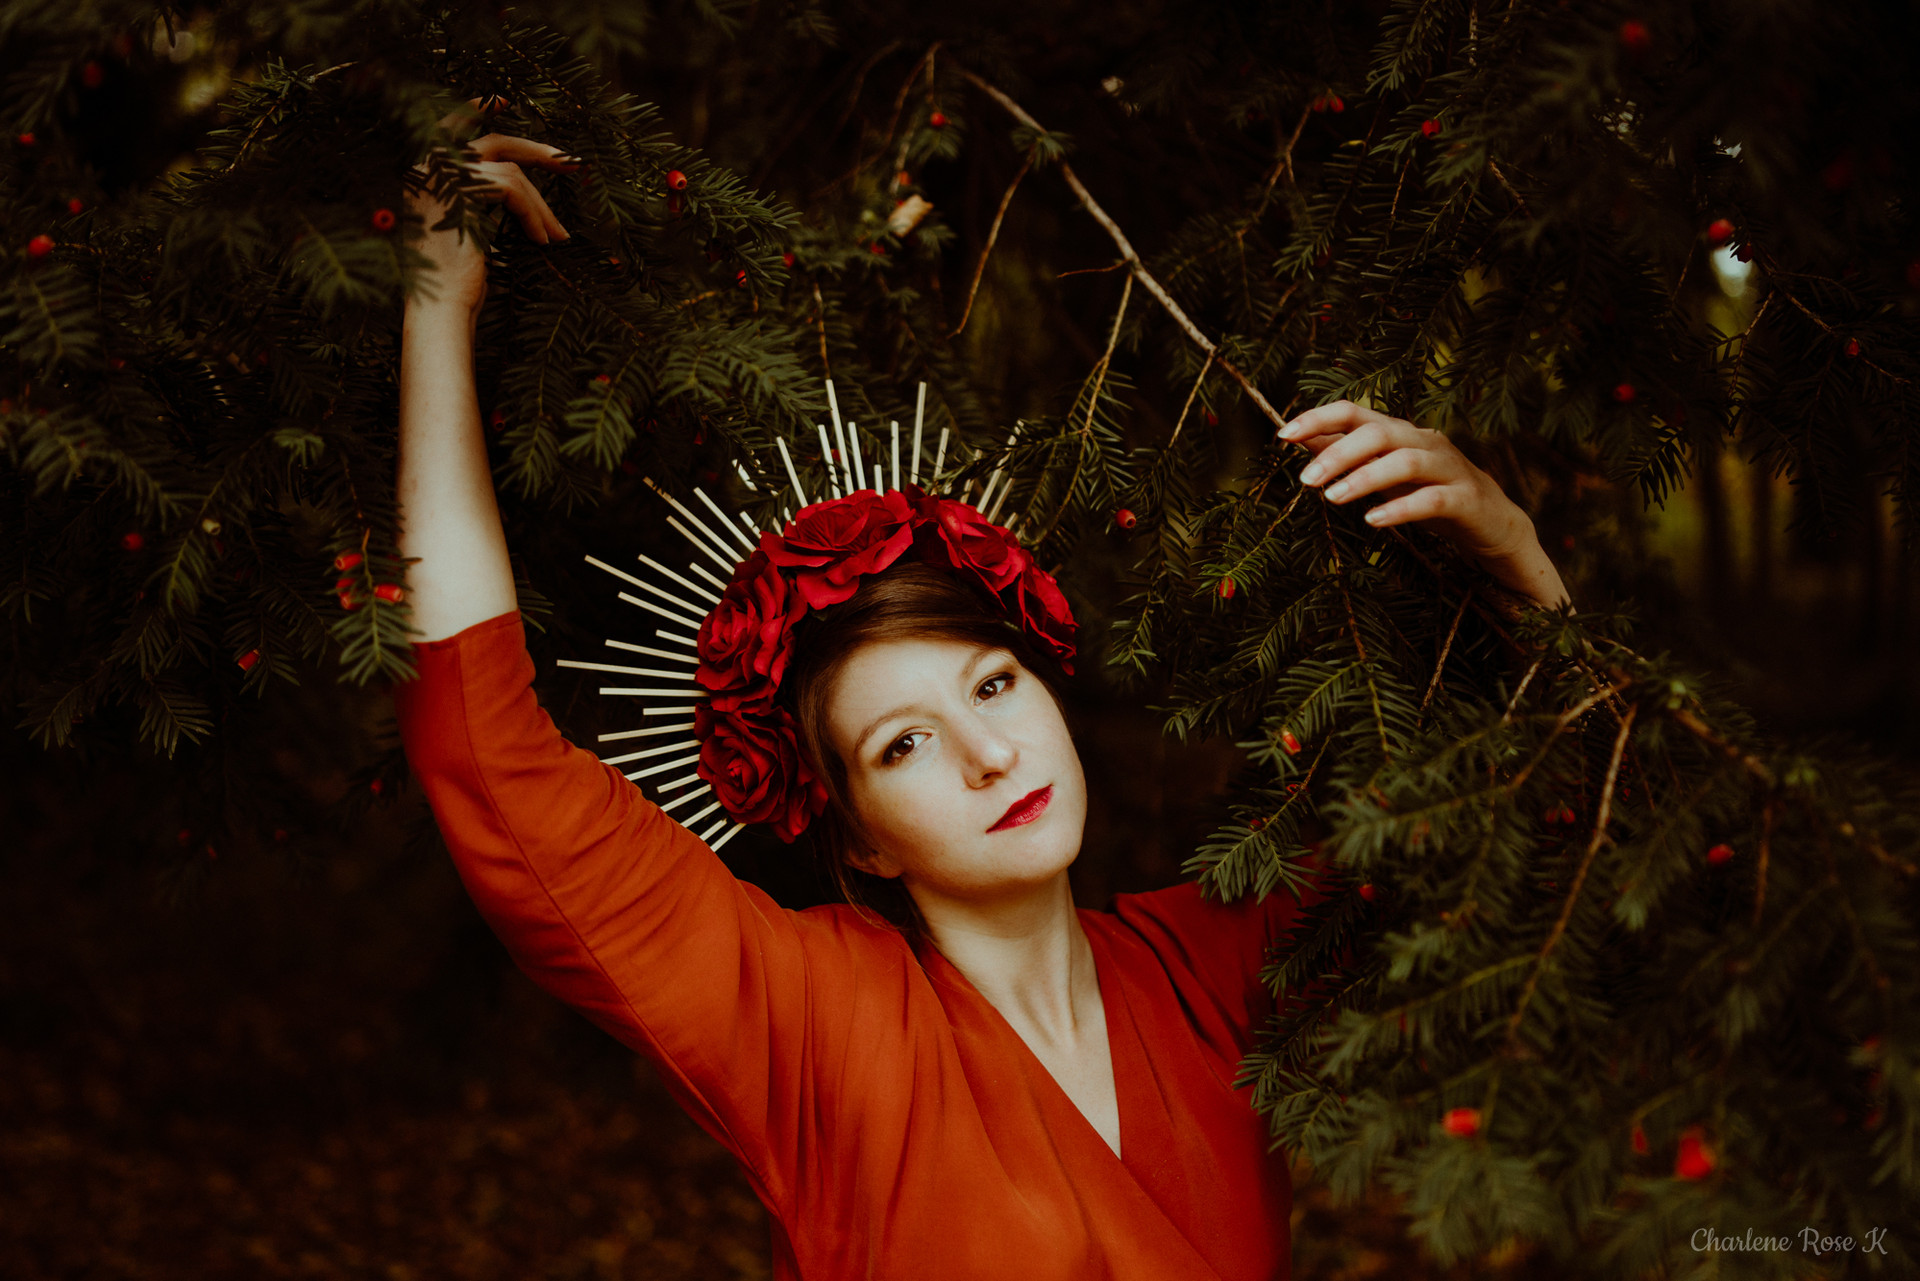 seance-photo-troyes-solo-femme-exterieur-automne-crk-12